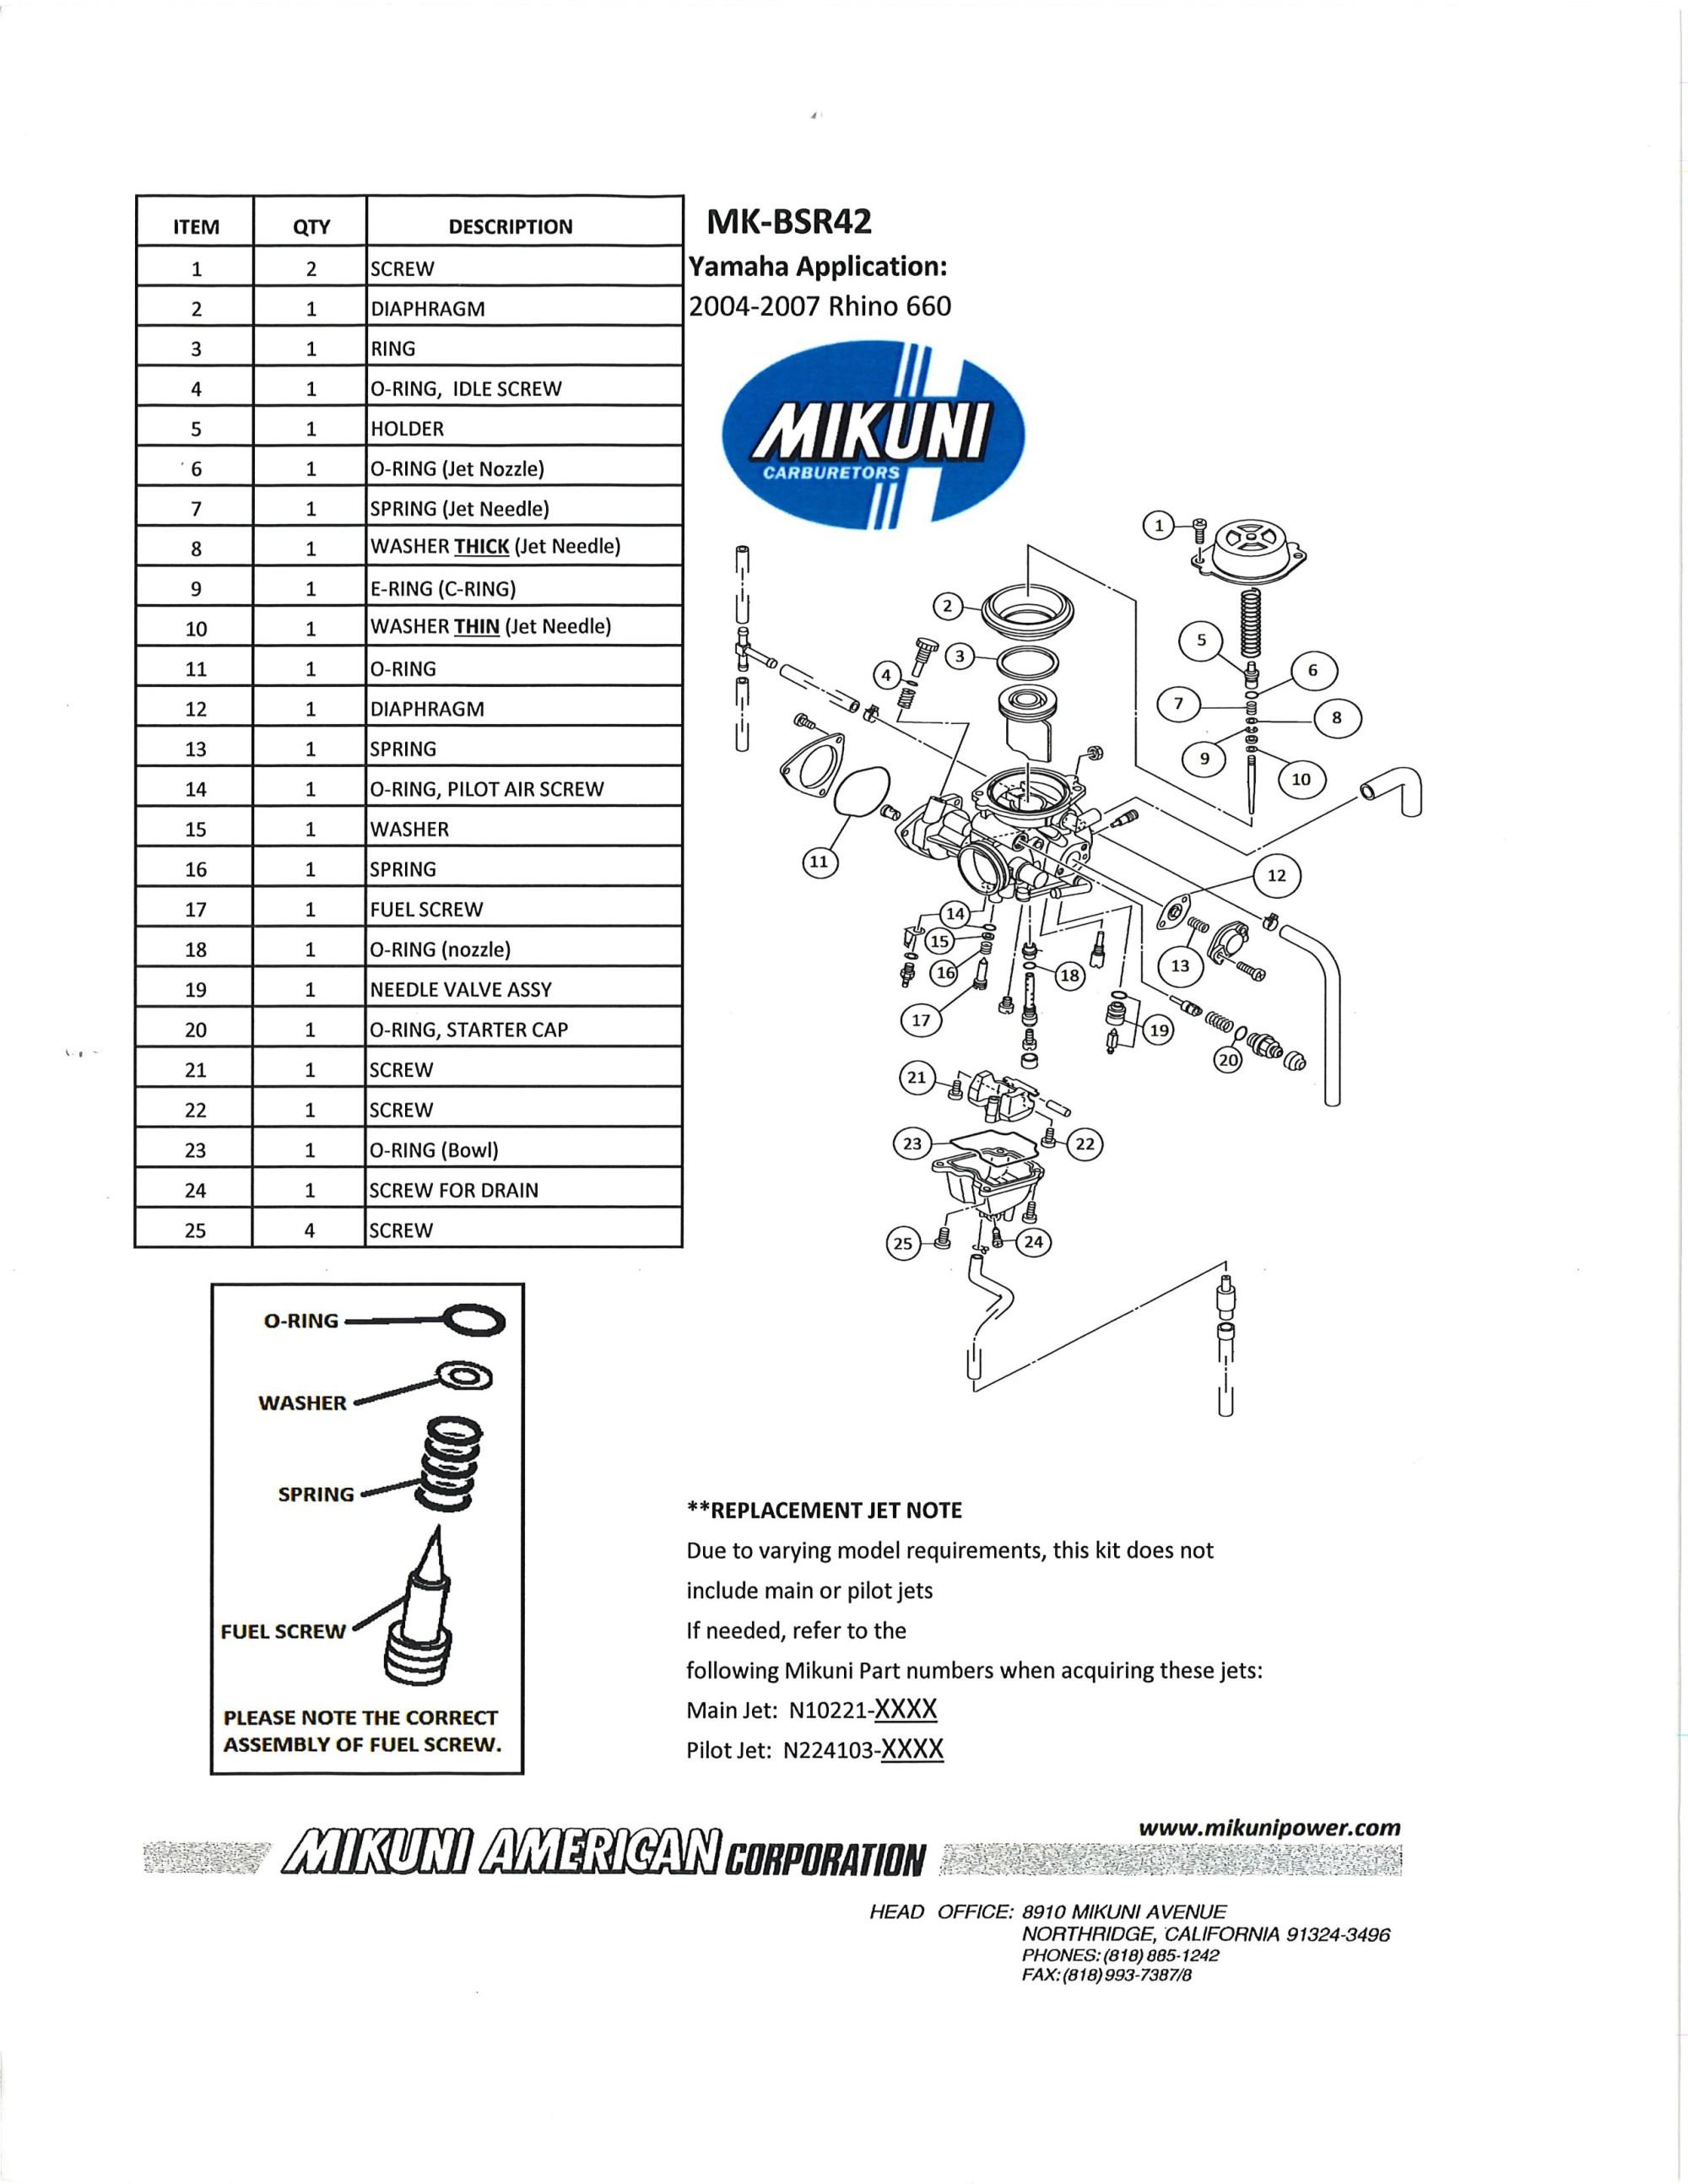 hight resolution of mikuni mk bsr42 carburetor rebuild kit exploded view parts list